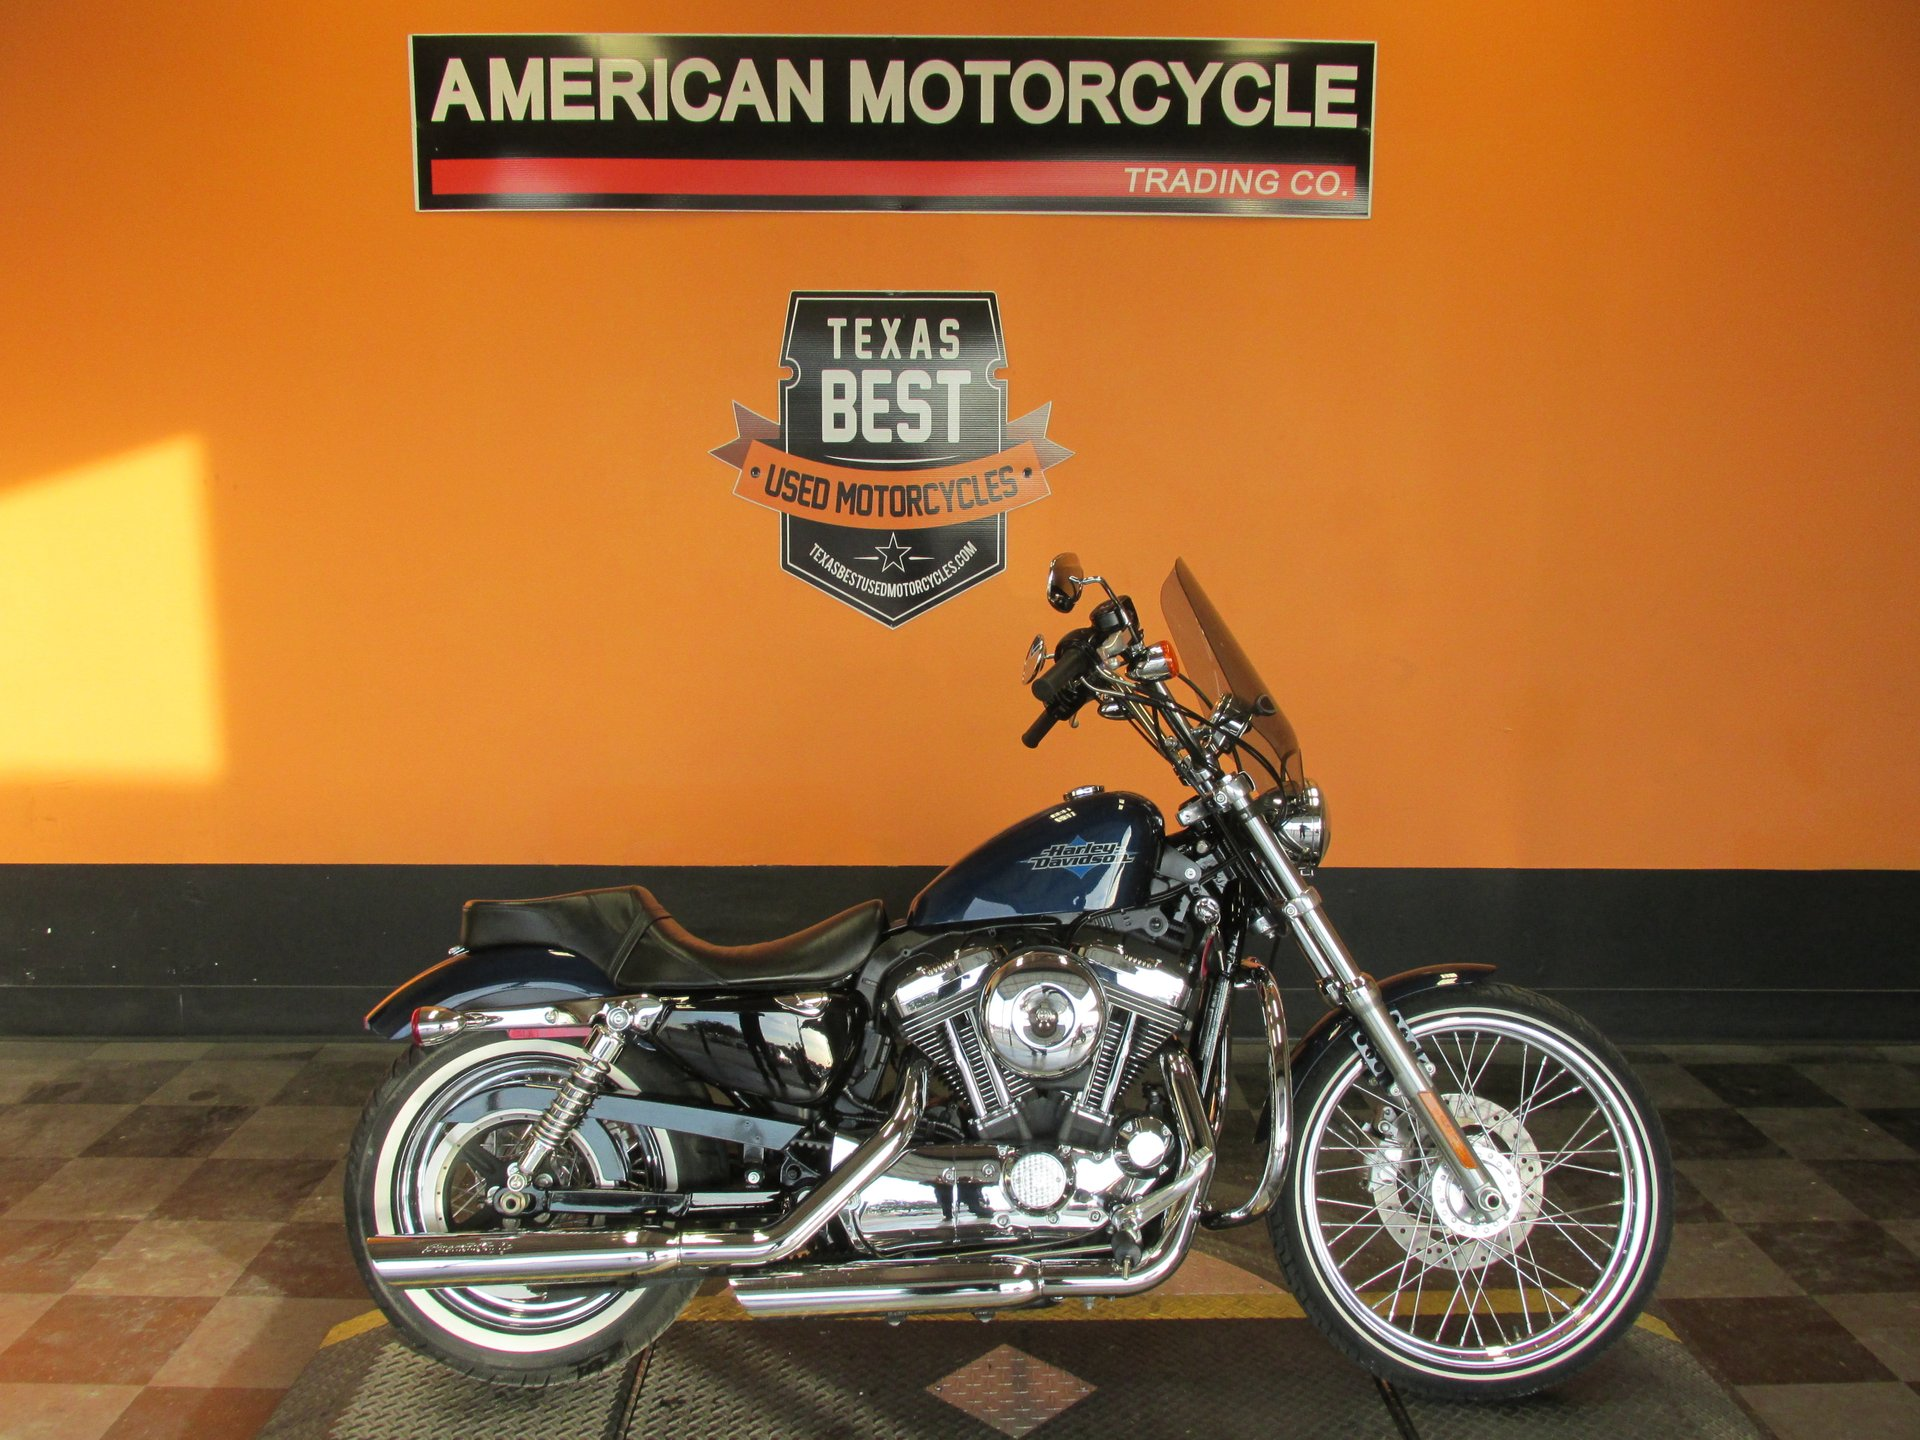 2012 Harley Davidson Sportster 1200 American Motorcycle Trading Company Used Harley Davidson Motorcycles